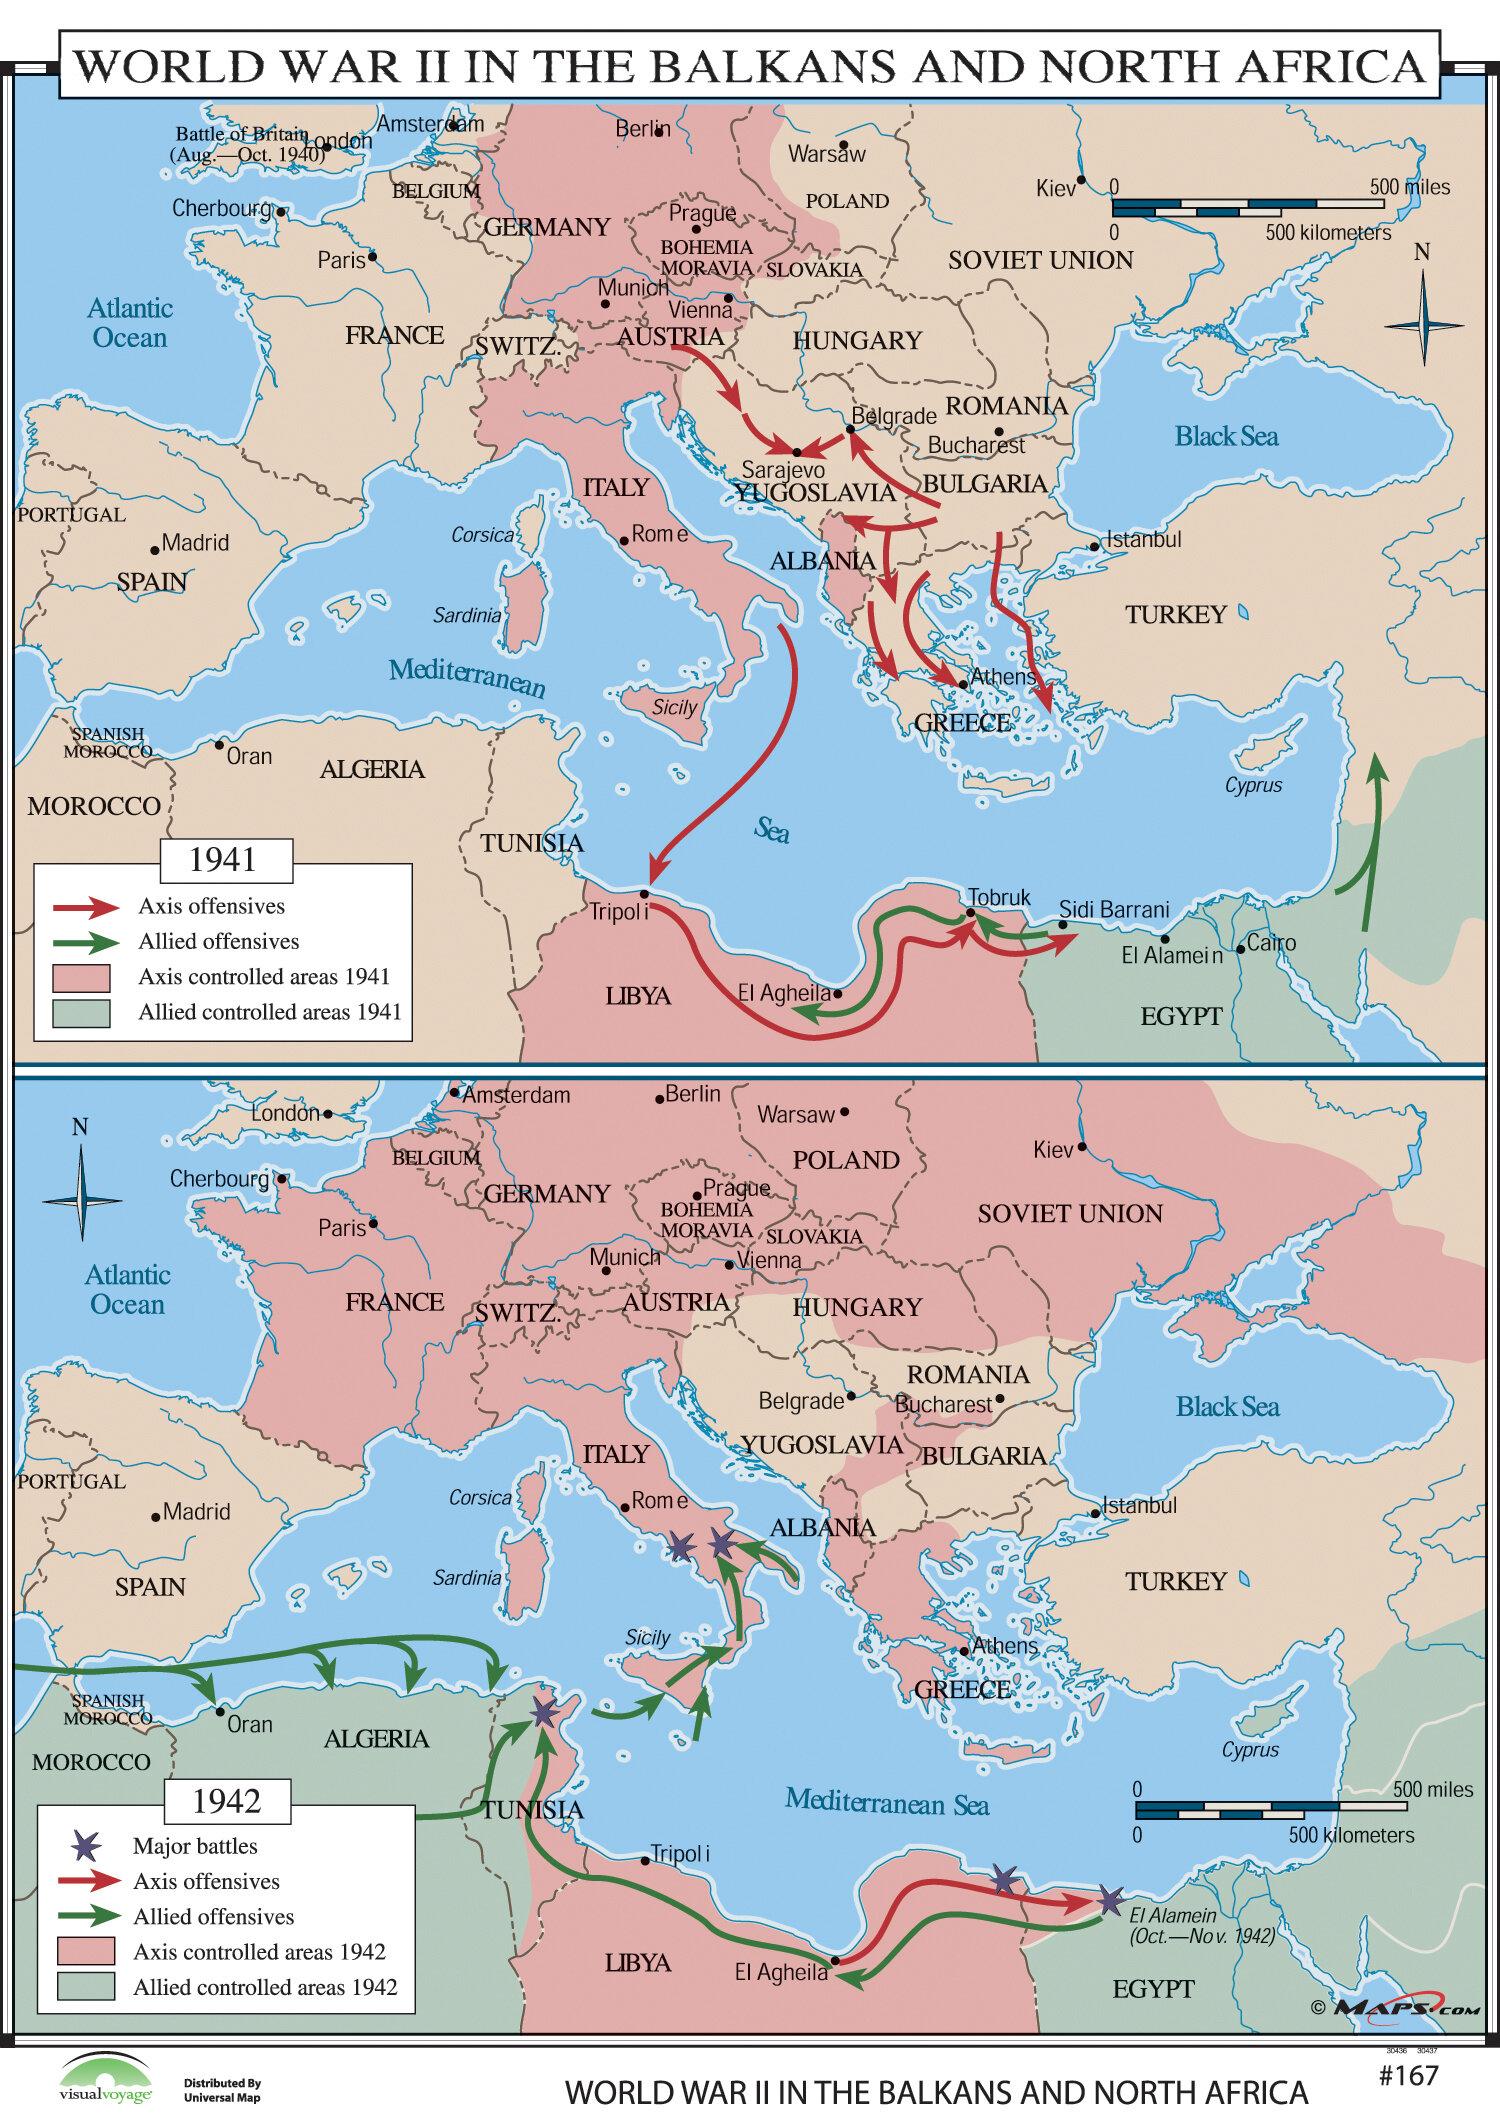 Universal map world history wall maps world war ii in balkans universal map world history wall maps world war ii in balkans north africa reviews wayfair gumiabroncs Image collections